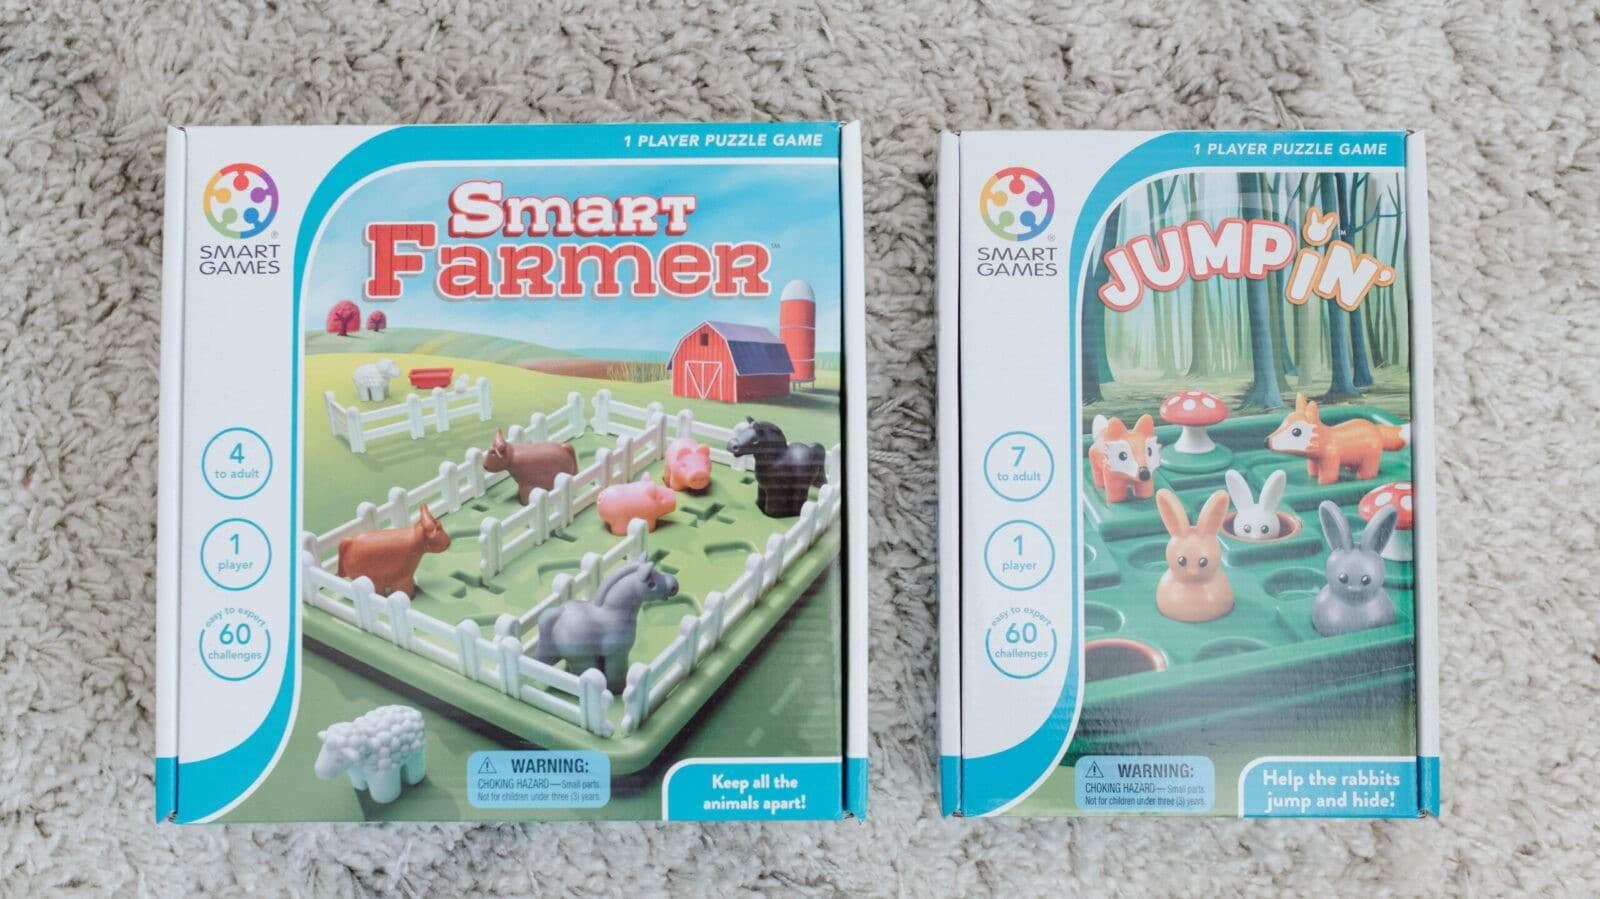 SmartGames Smart Farmer and Jumpin